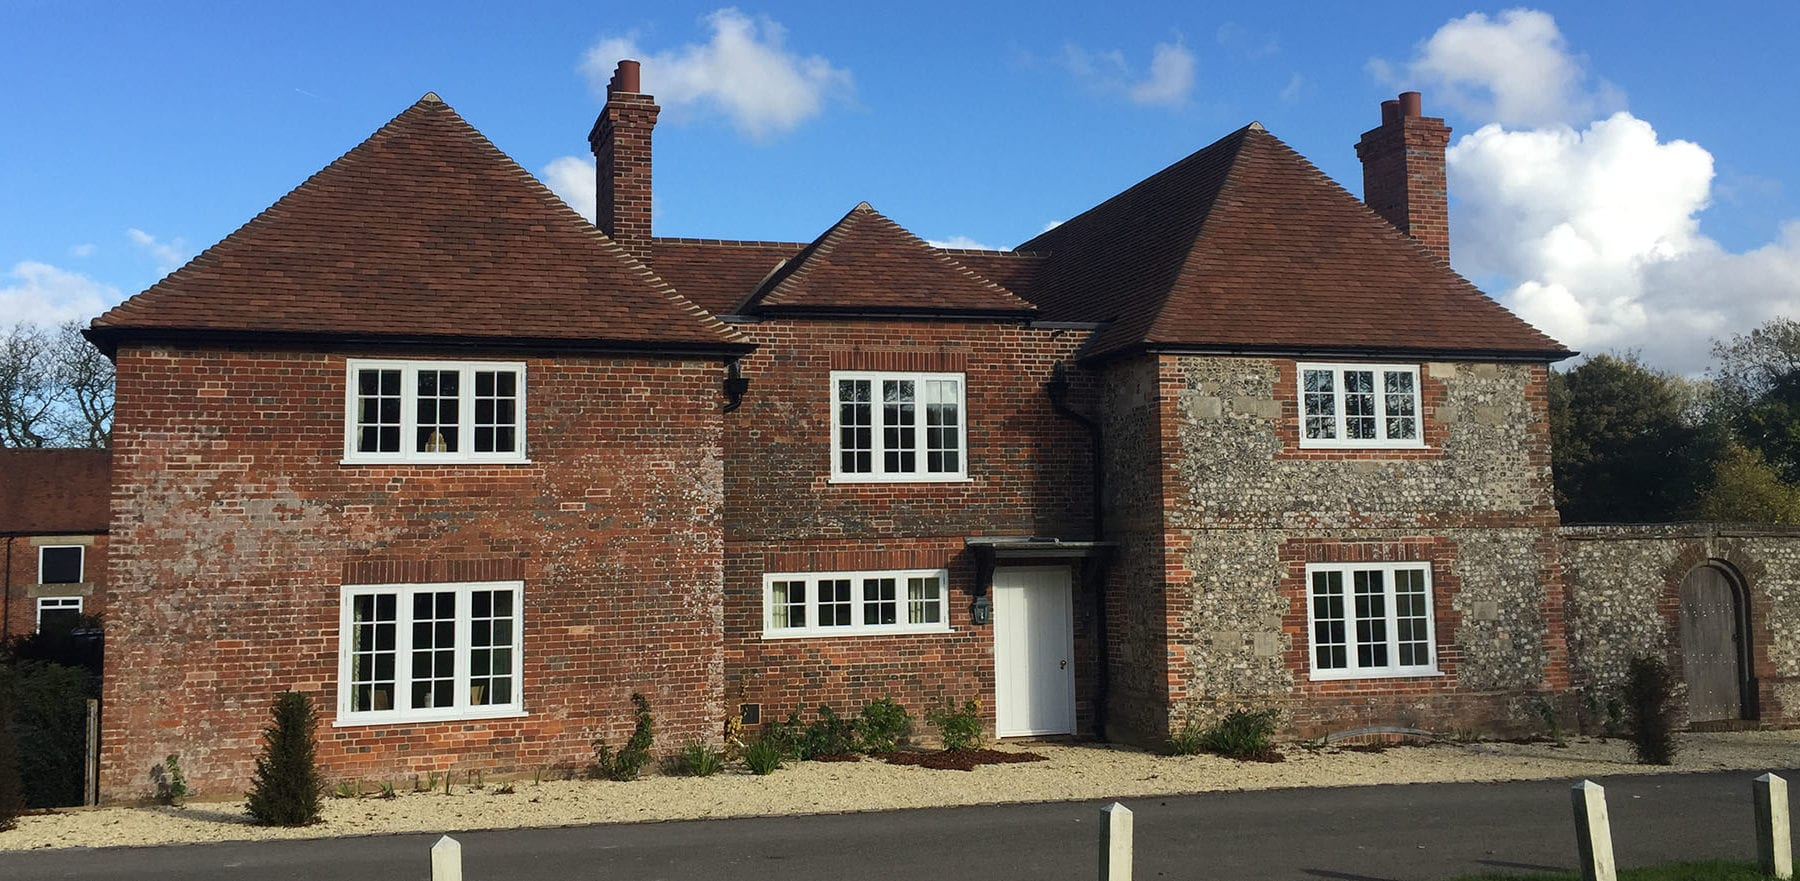 Lifestiles - Handmade Heather Clay Roof Tiles - Barlow, England 4